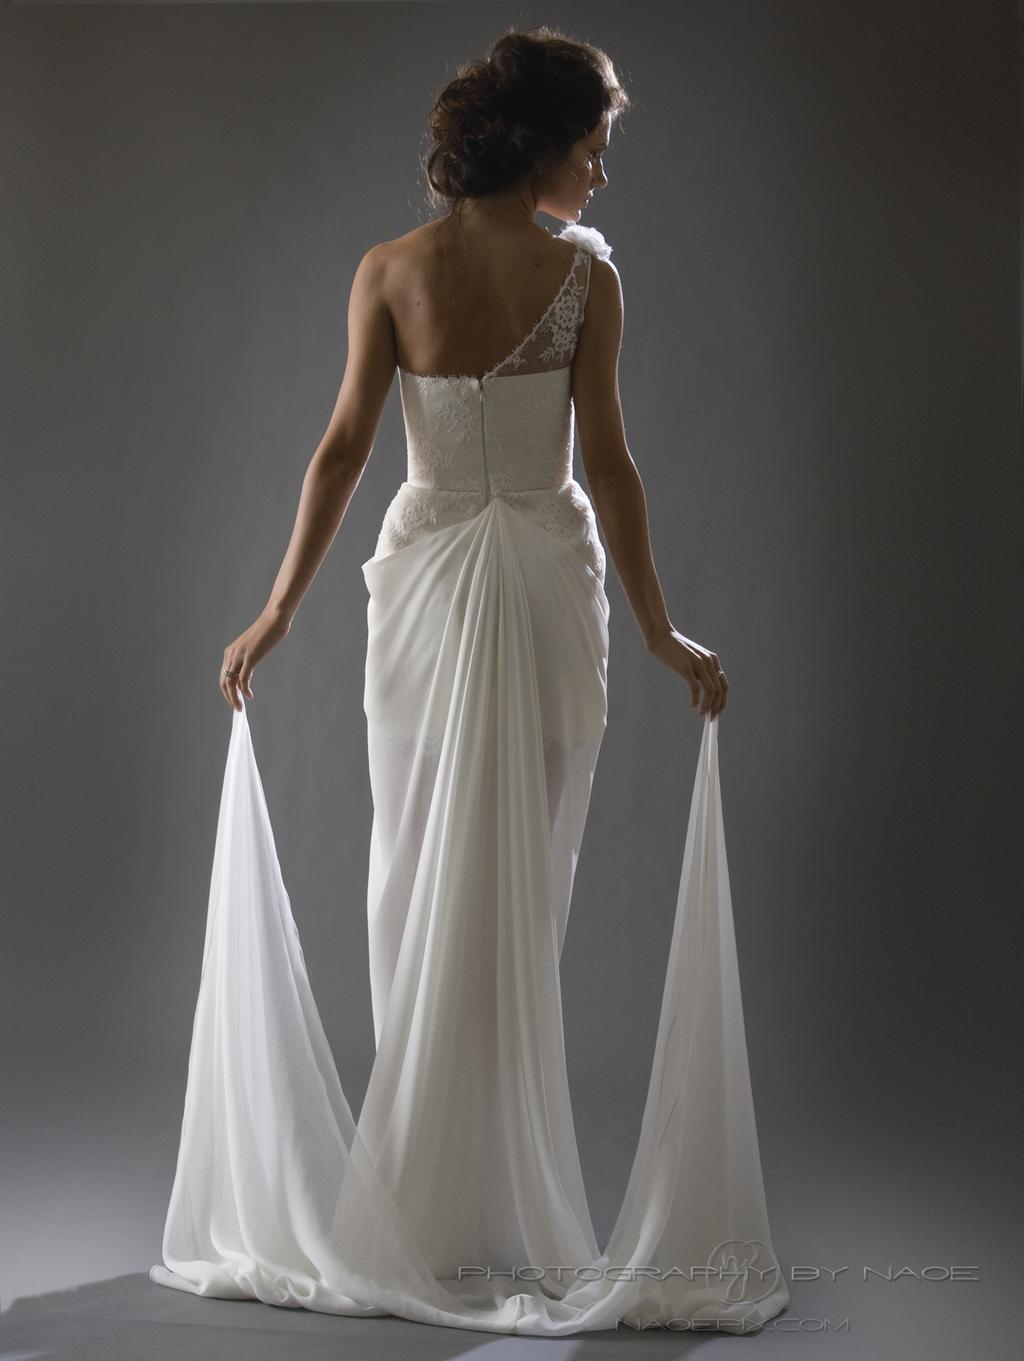 Wedding-dress-spring-2013-bridal_gown-cocoe-voci-9-back.full